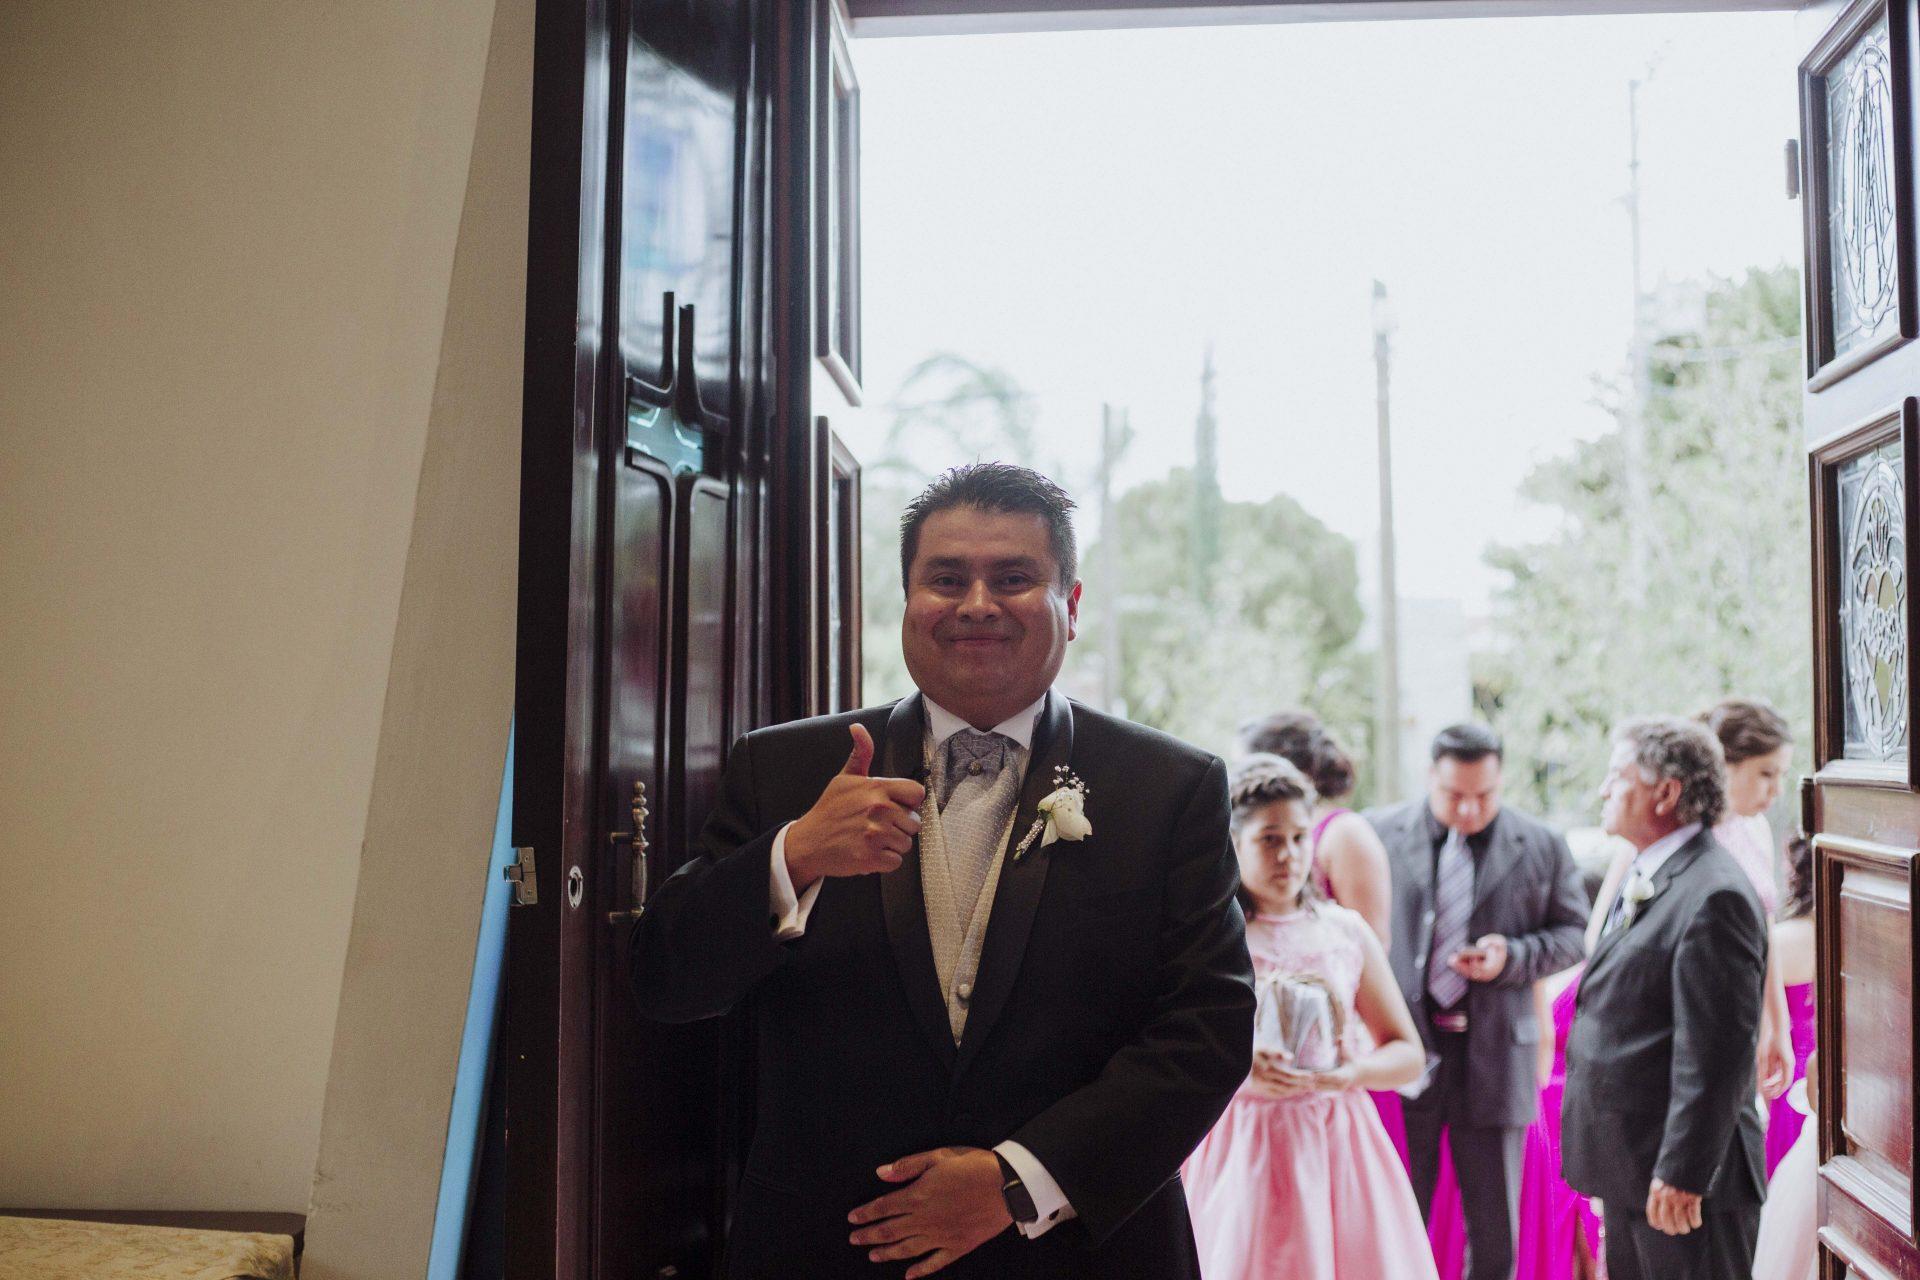 fotografo_profesional_zacatecas_chihuahua_bodas_xv_mexico-40